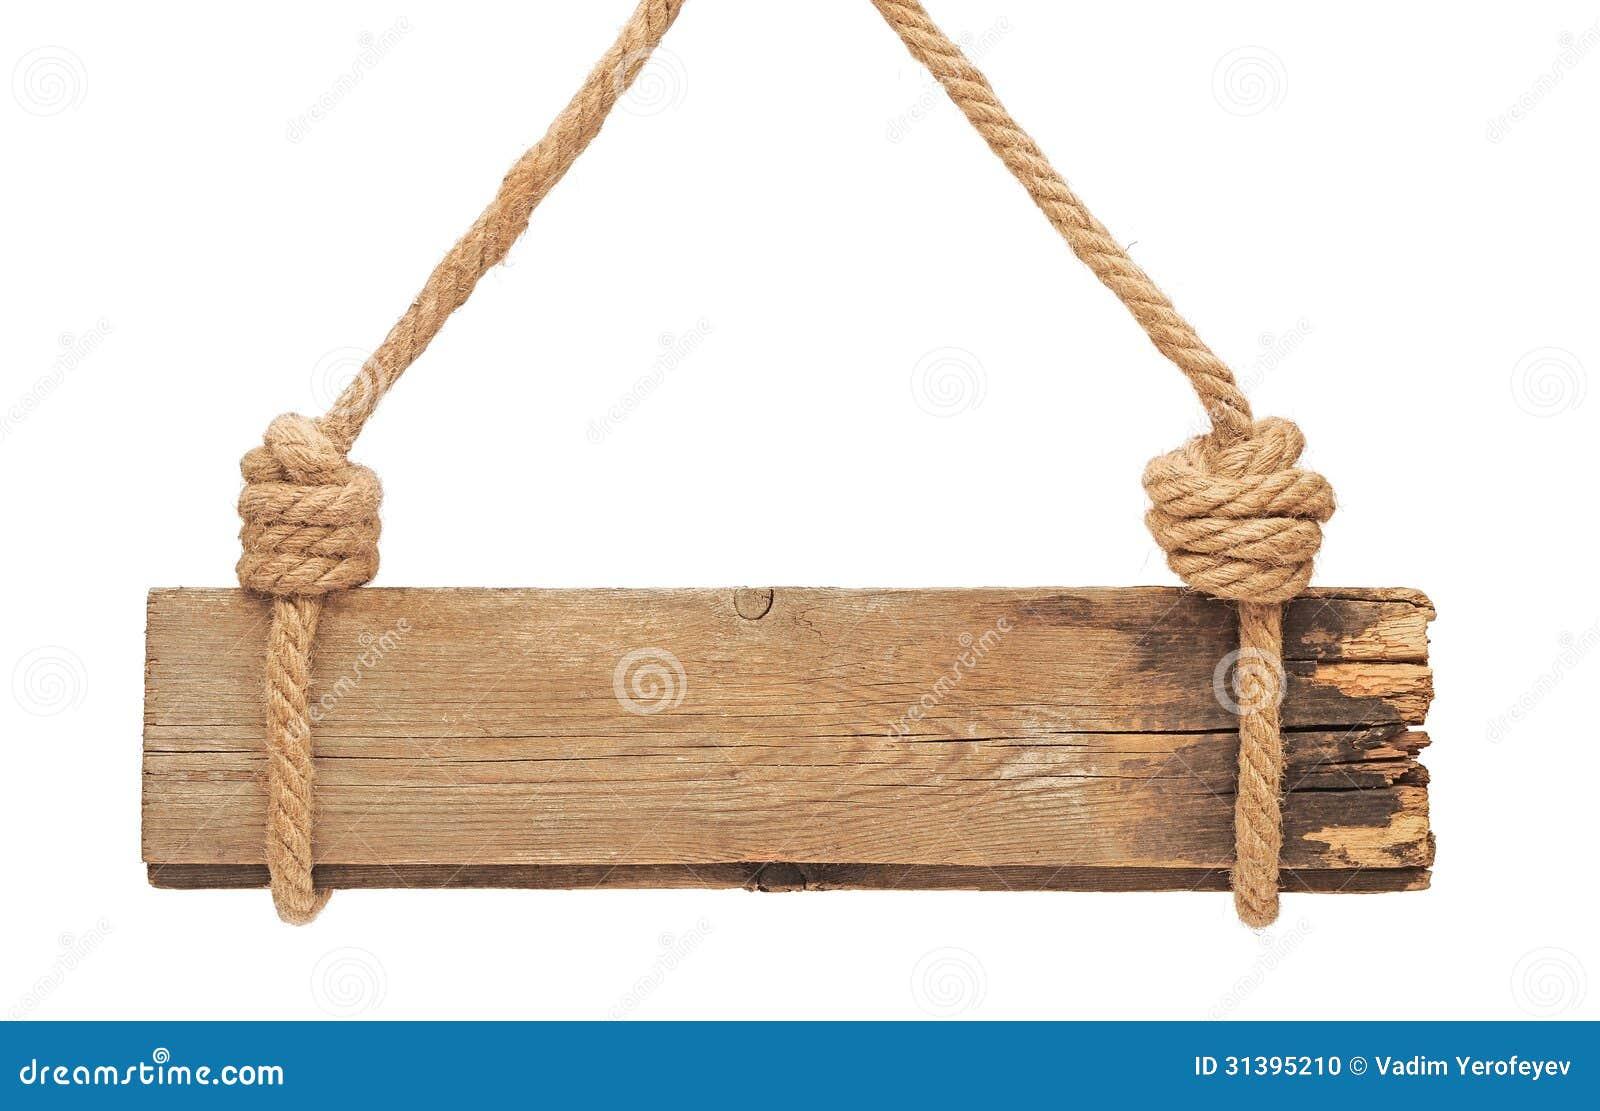 wooden sign stock photo image of board advice hanging. Black Bedroom Furniture Sets. Home Design Ideas